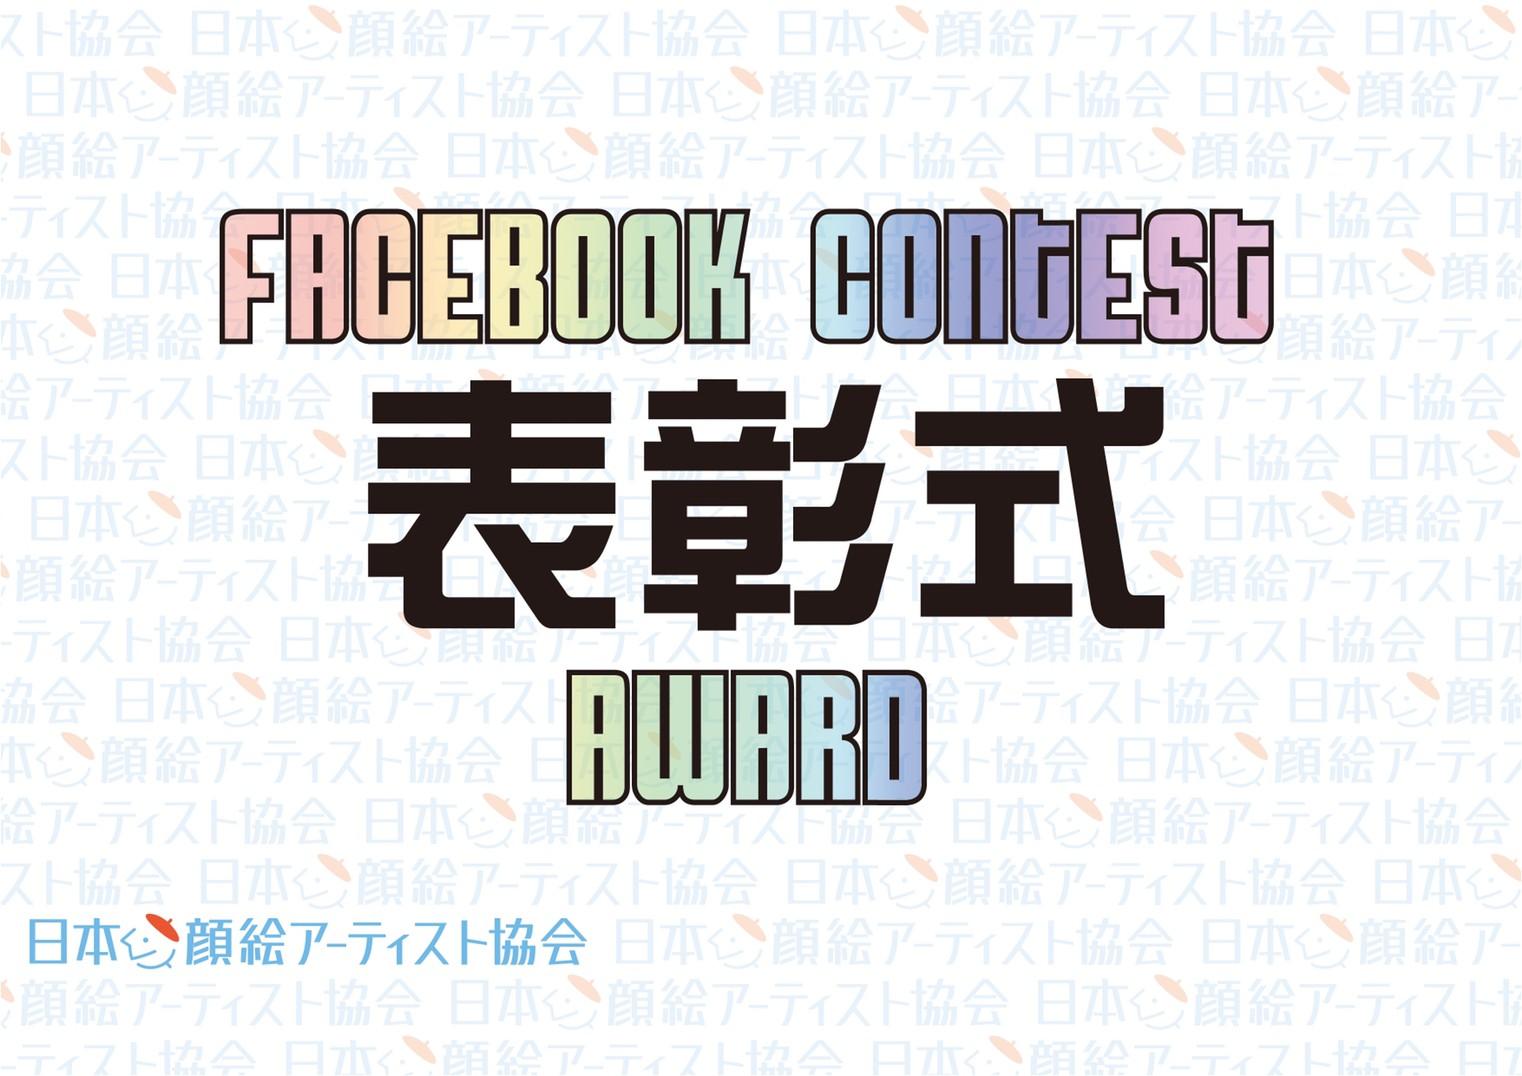 Facebookコンテスト表彰者発表